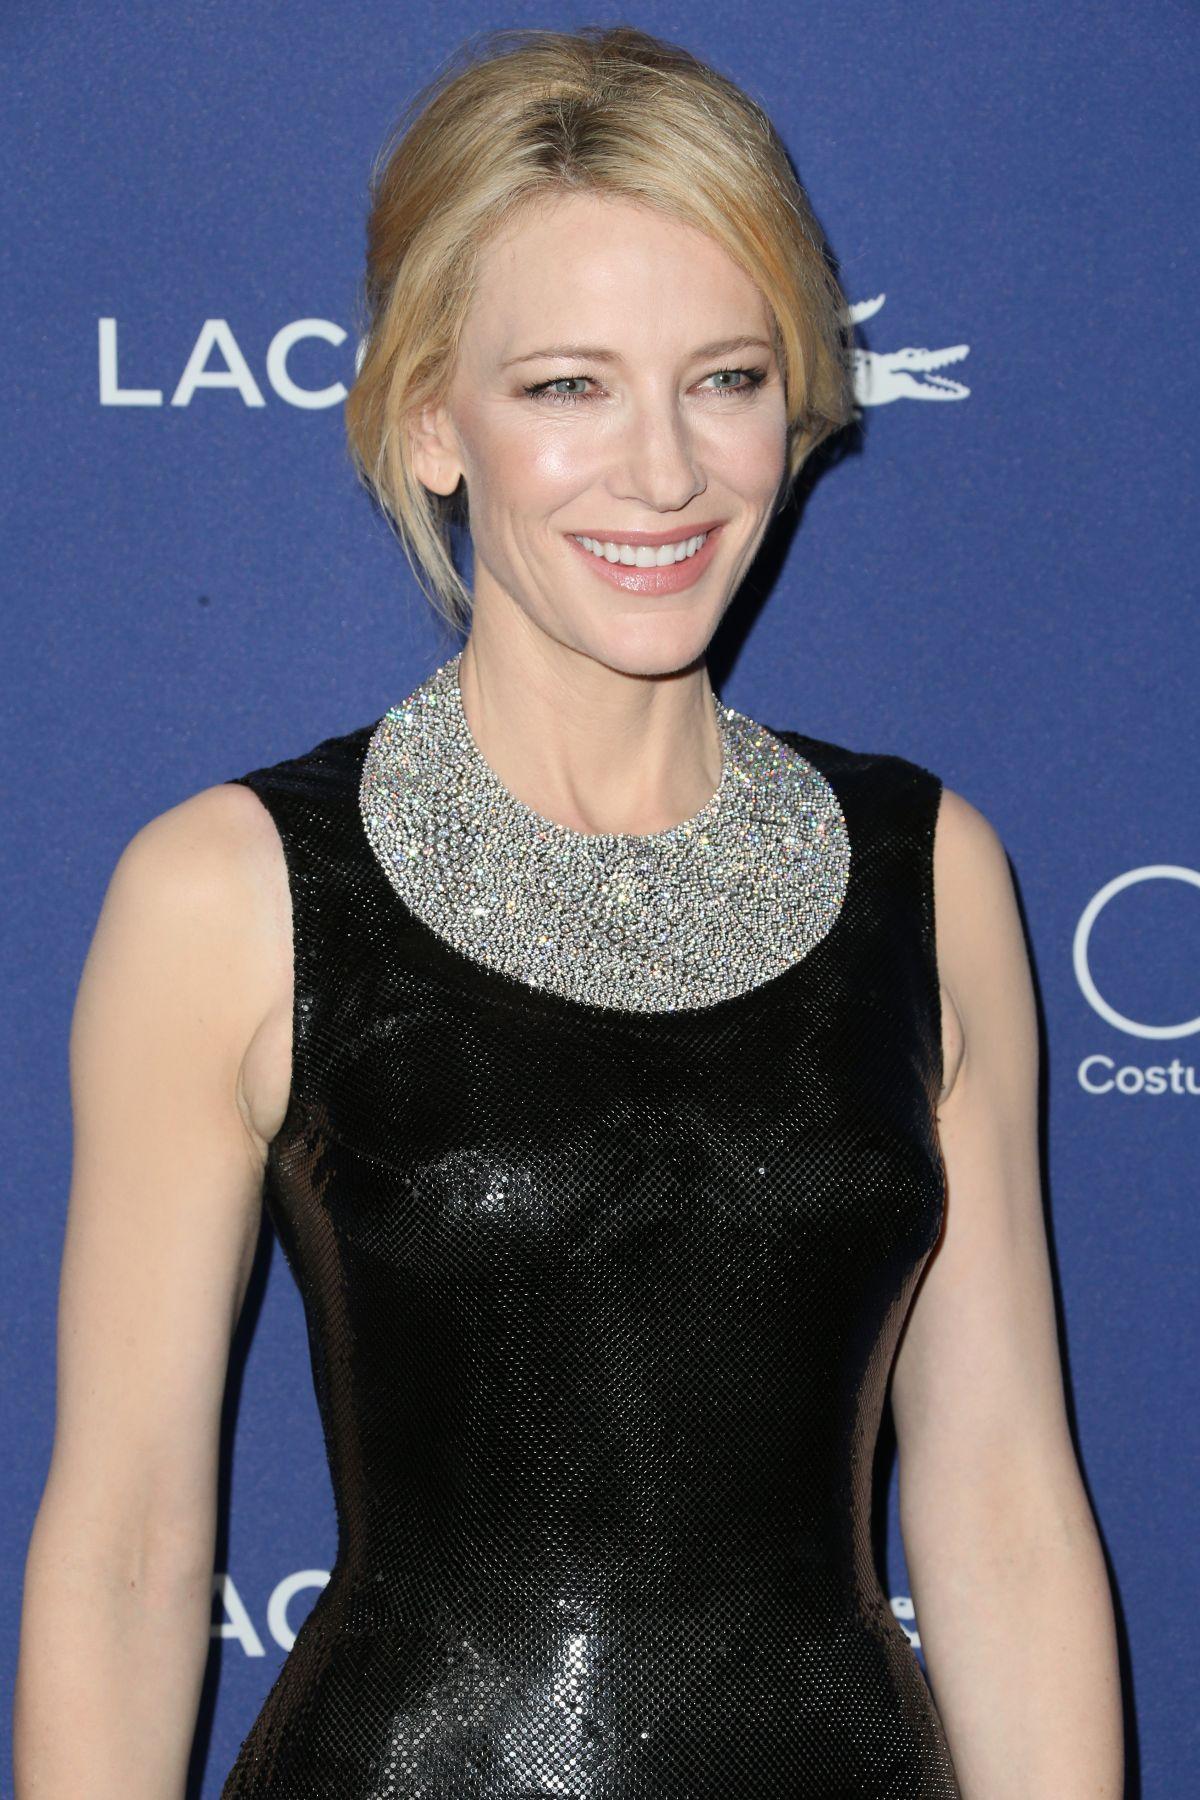 Cate Blanchett Archives - HawtCelebs - HawtCelebs Cate Blanchett 2016